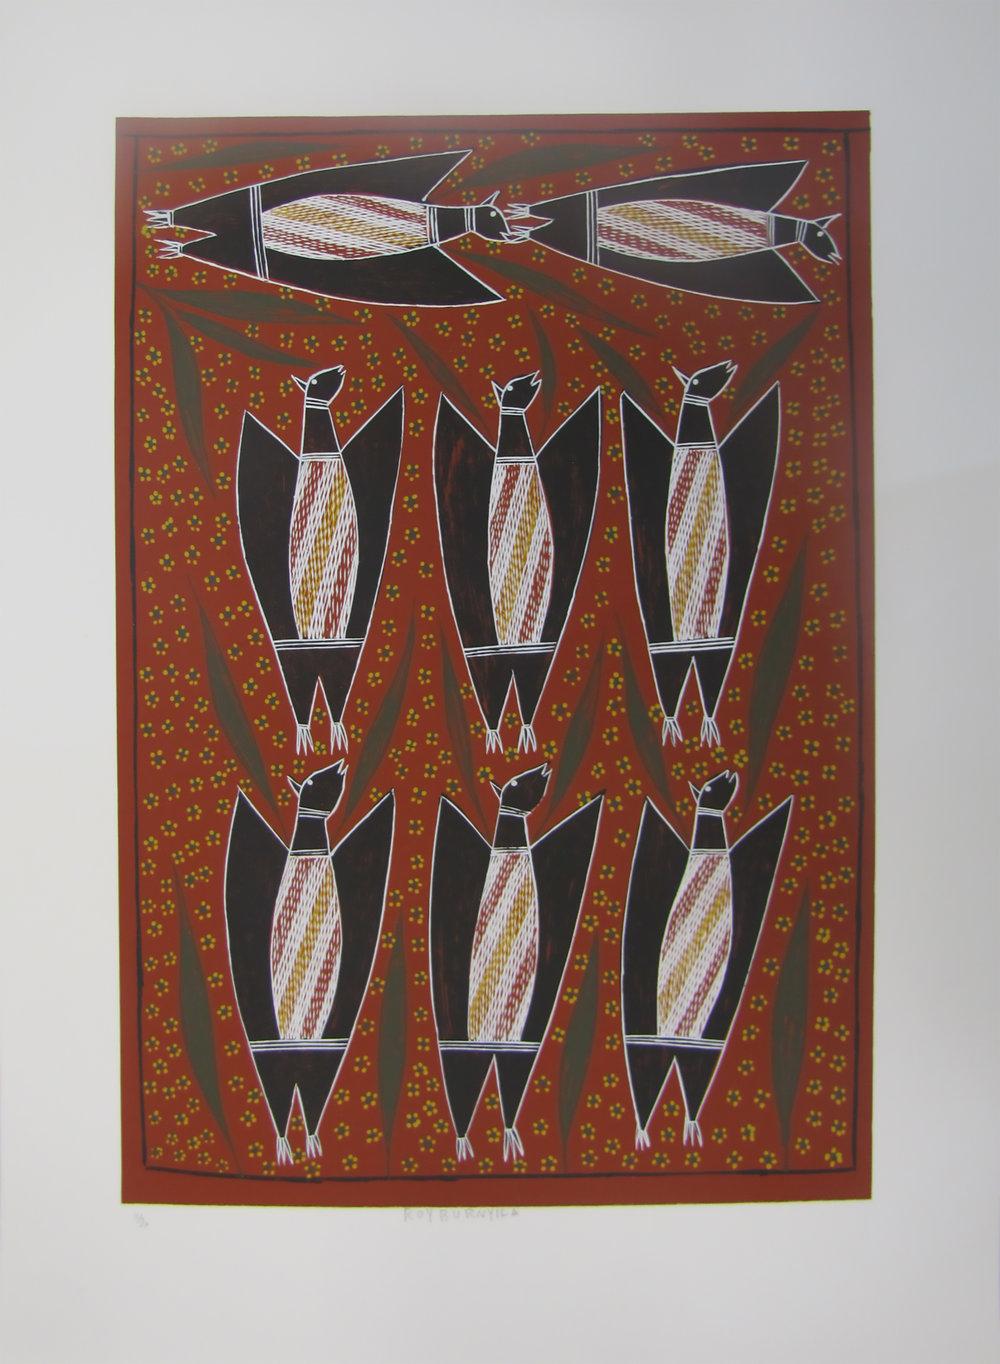 Roy Burniyala, Warrynu (Flying Fox). 2017  Silkscreen. Ed 10/30   59.5 x 42 cm   $350 (unframed)   $550 (framed)   Editions 11/30, 12/30 & 13/30 (unframed) also available